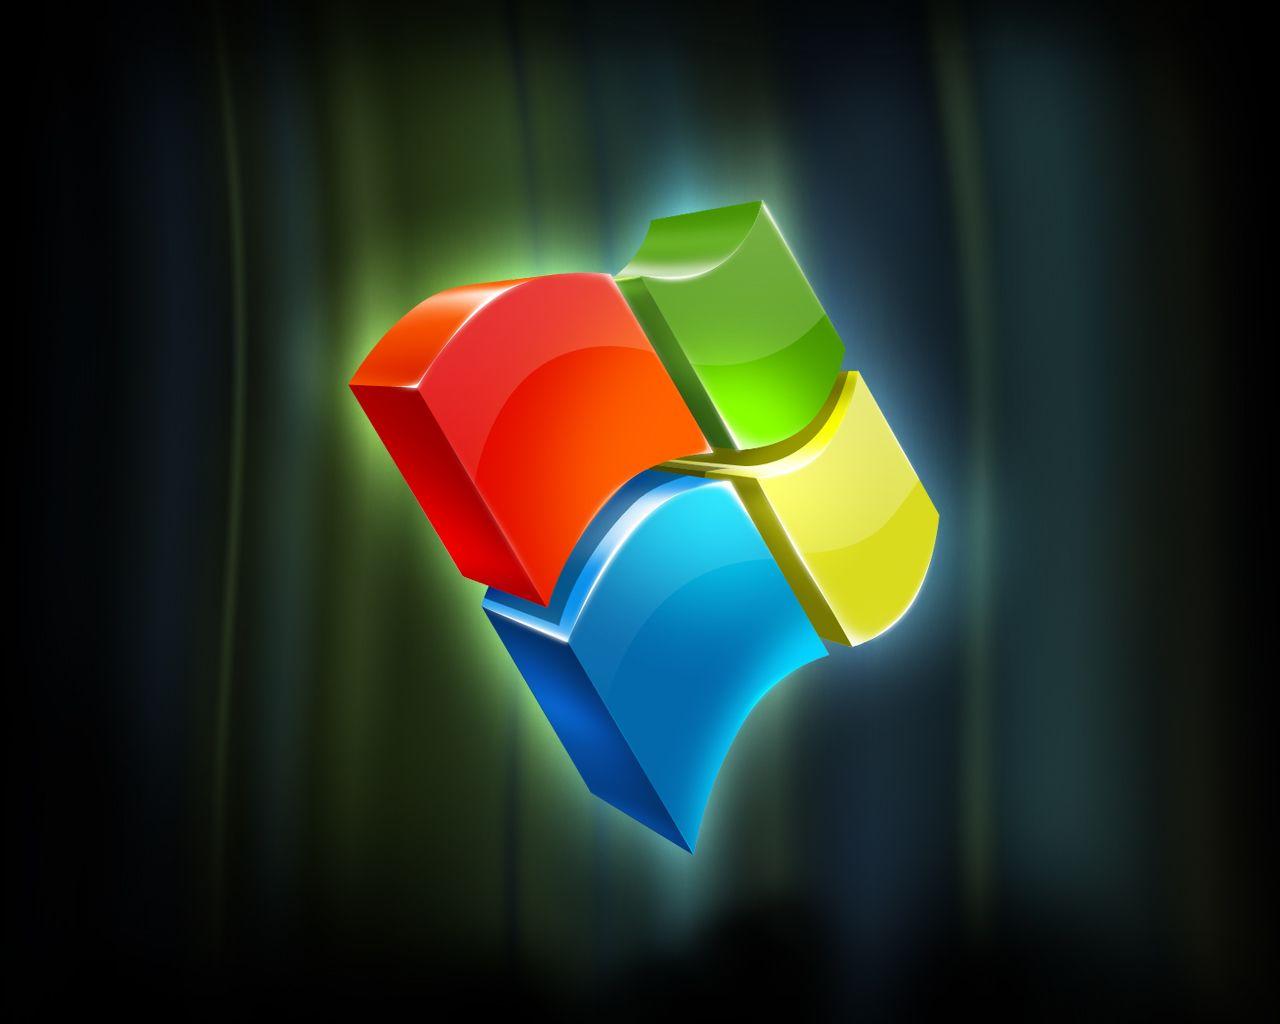 Windows 3d Wallpaper Apple Logo Wallpaper Windows Desktop Wallpaper Logo Wallpaper Hd